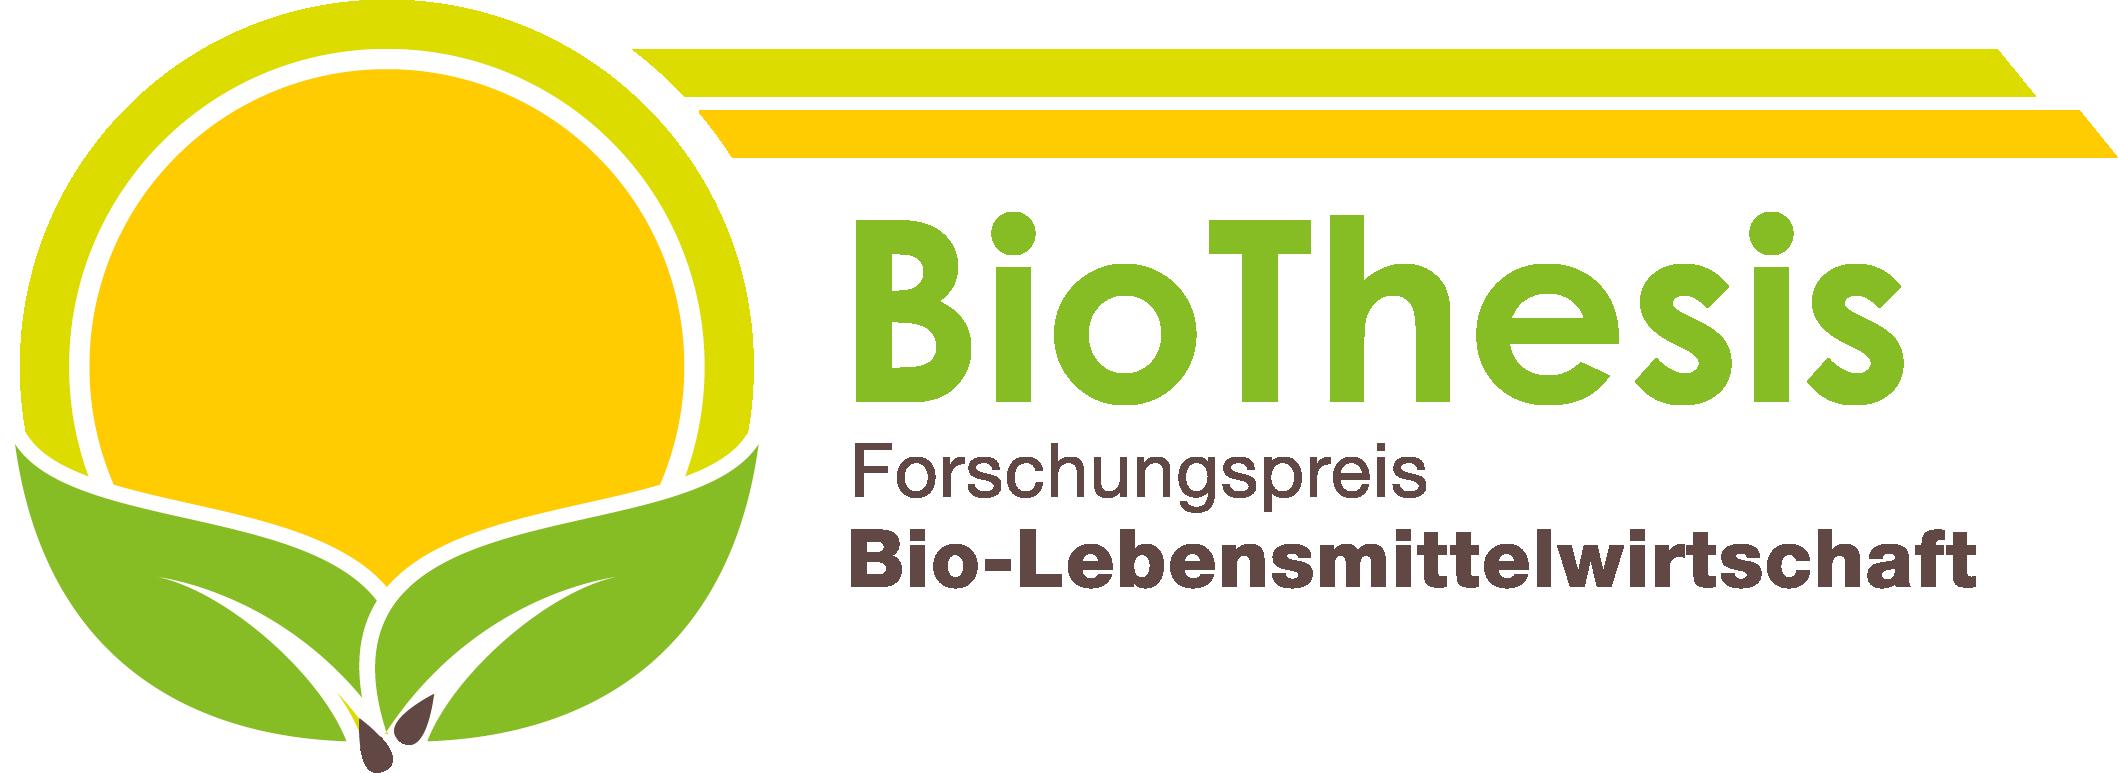 (c) BioThesis